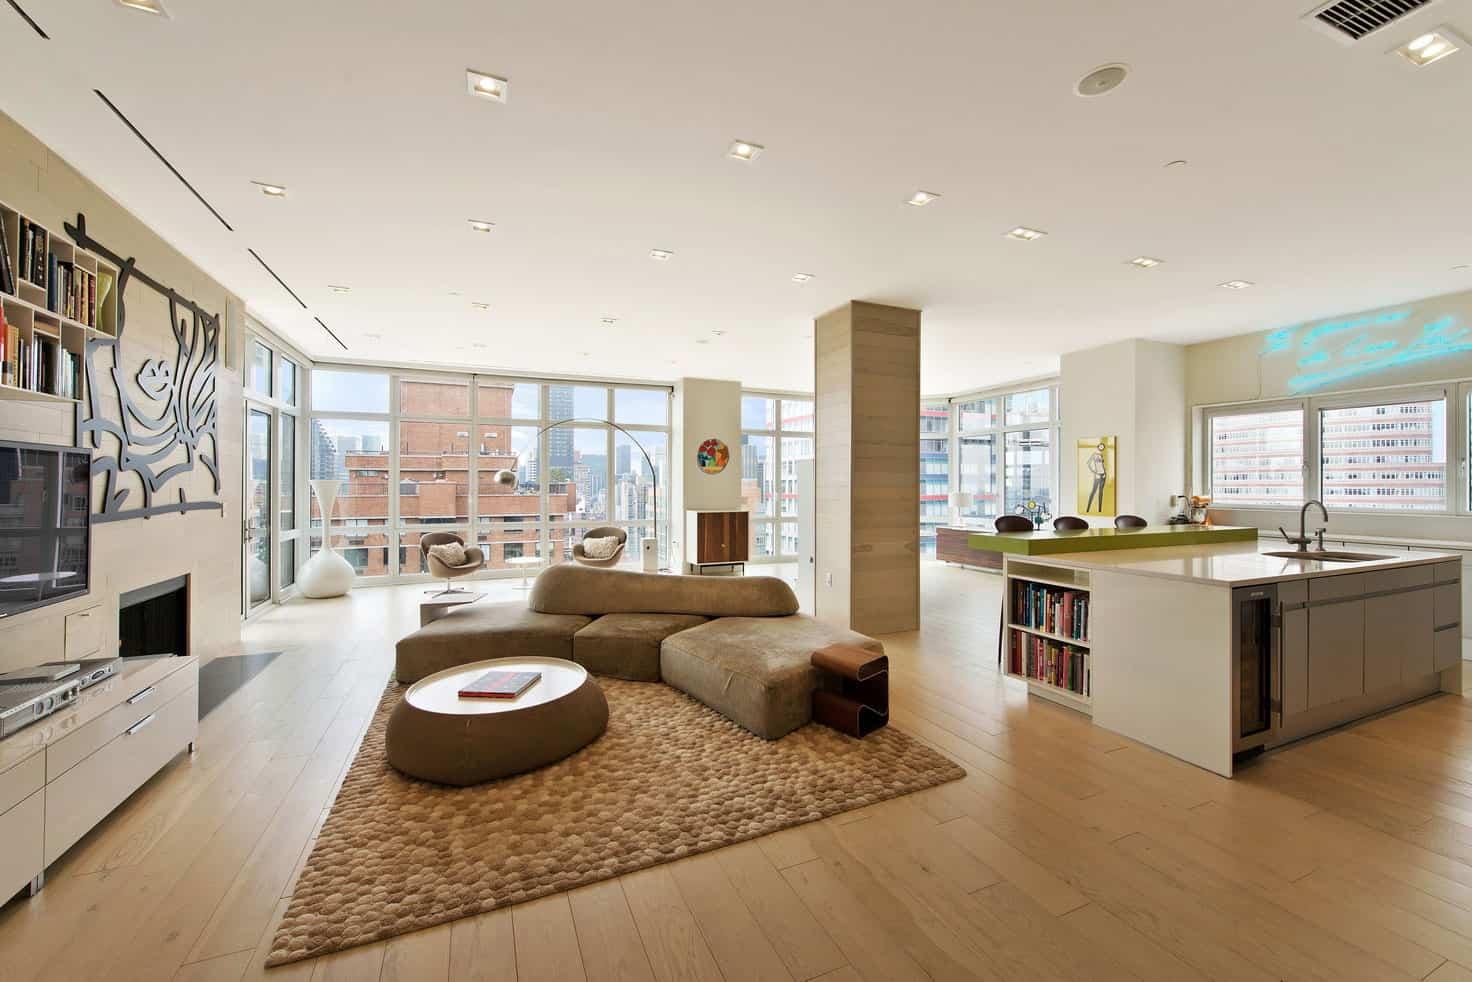 Neues Interieur Extravagantes Penthouse Design - waitingshare.com -